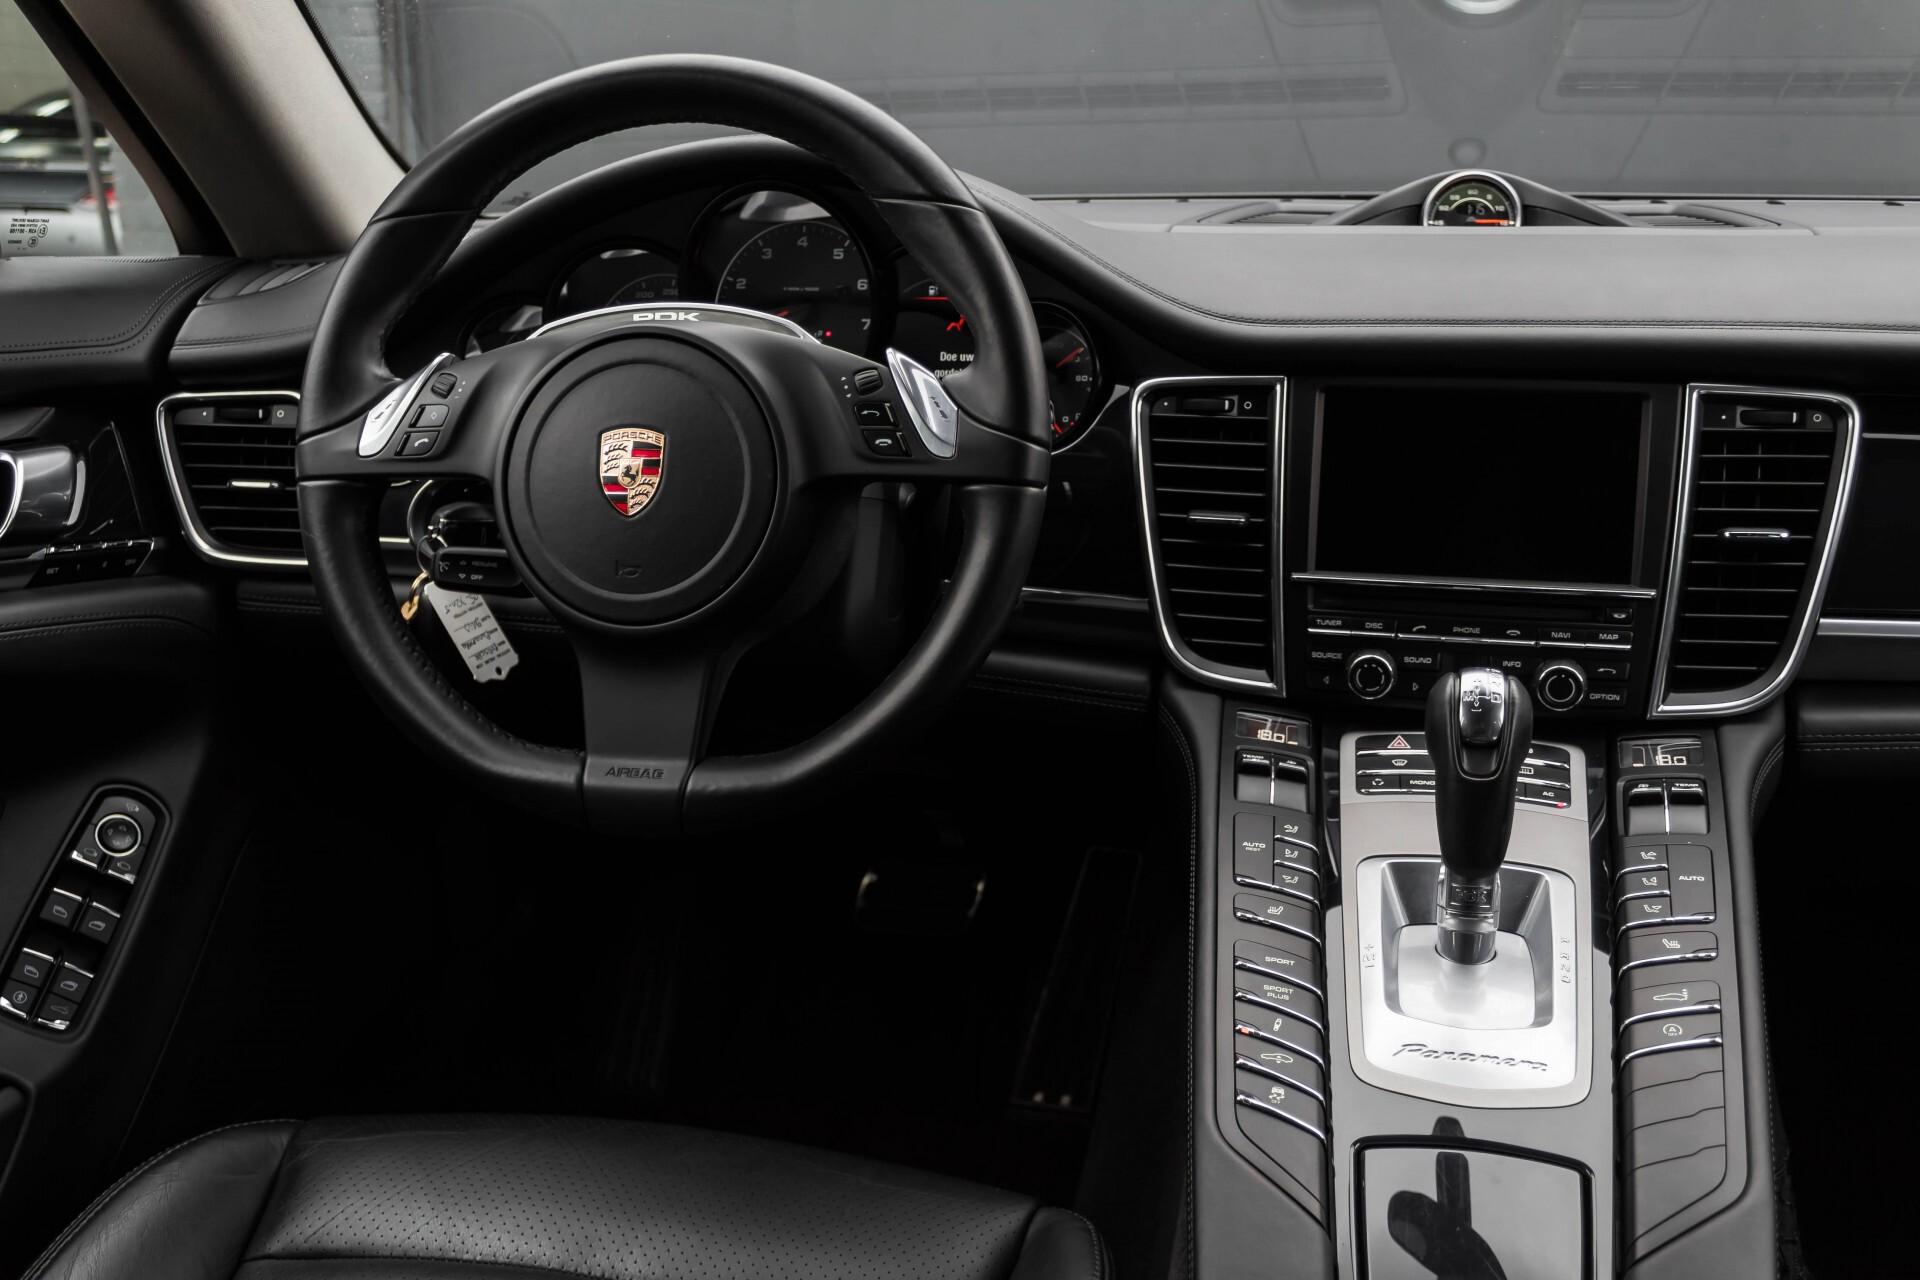 Porsche Panamera 3.6 4 Sportchrono/Luchtvering/Dak/Nappa/Aut7 Foto 8